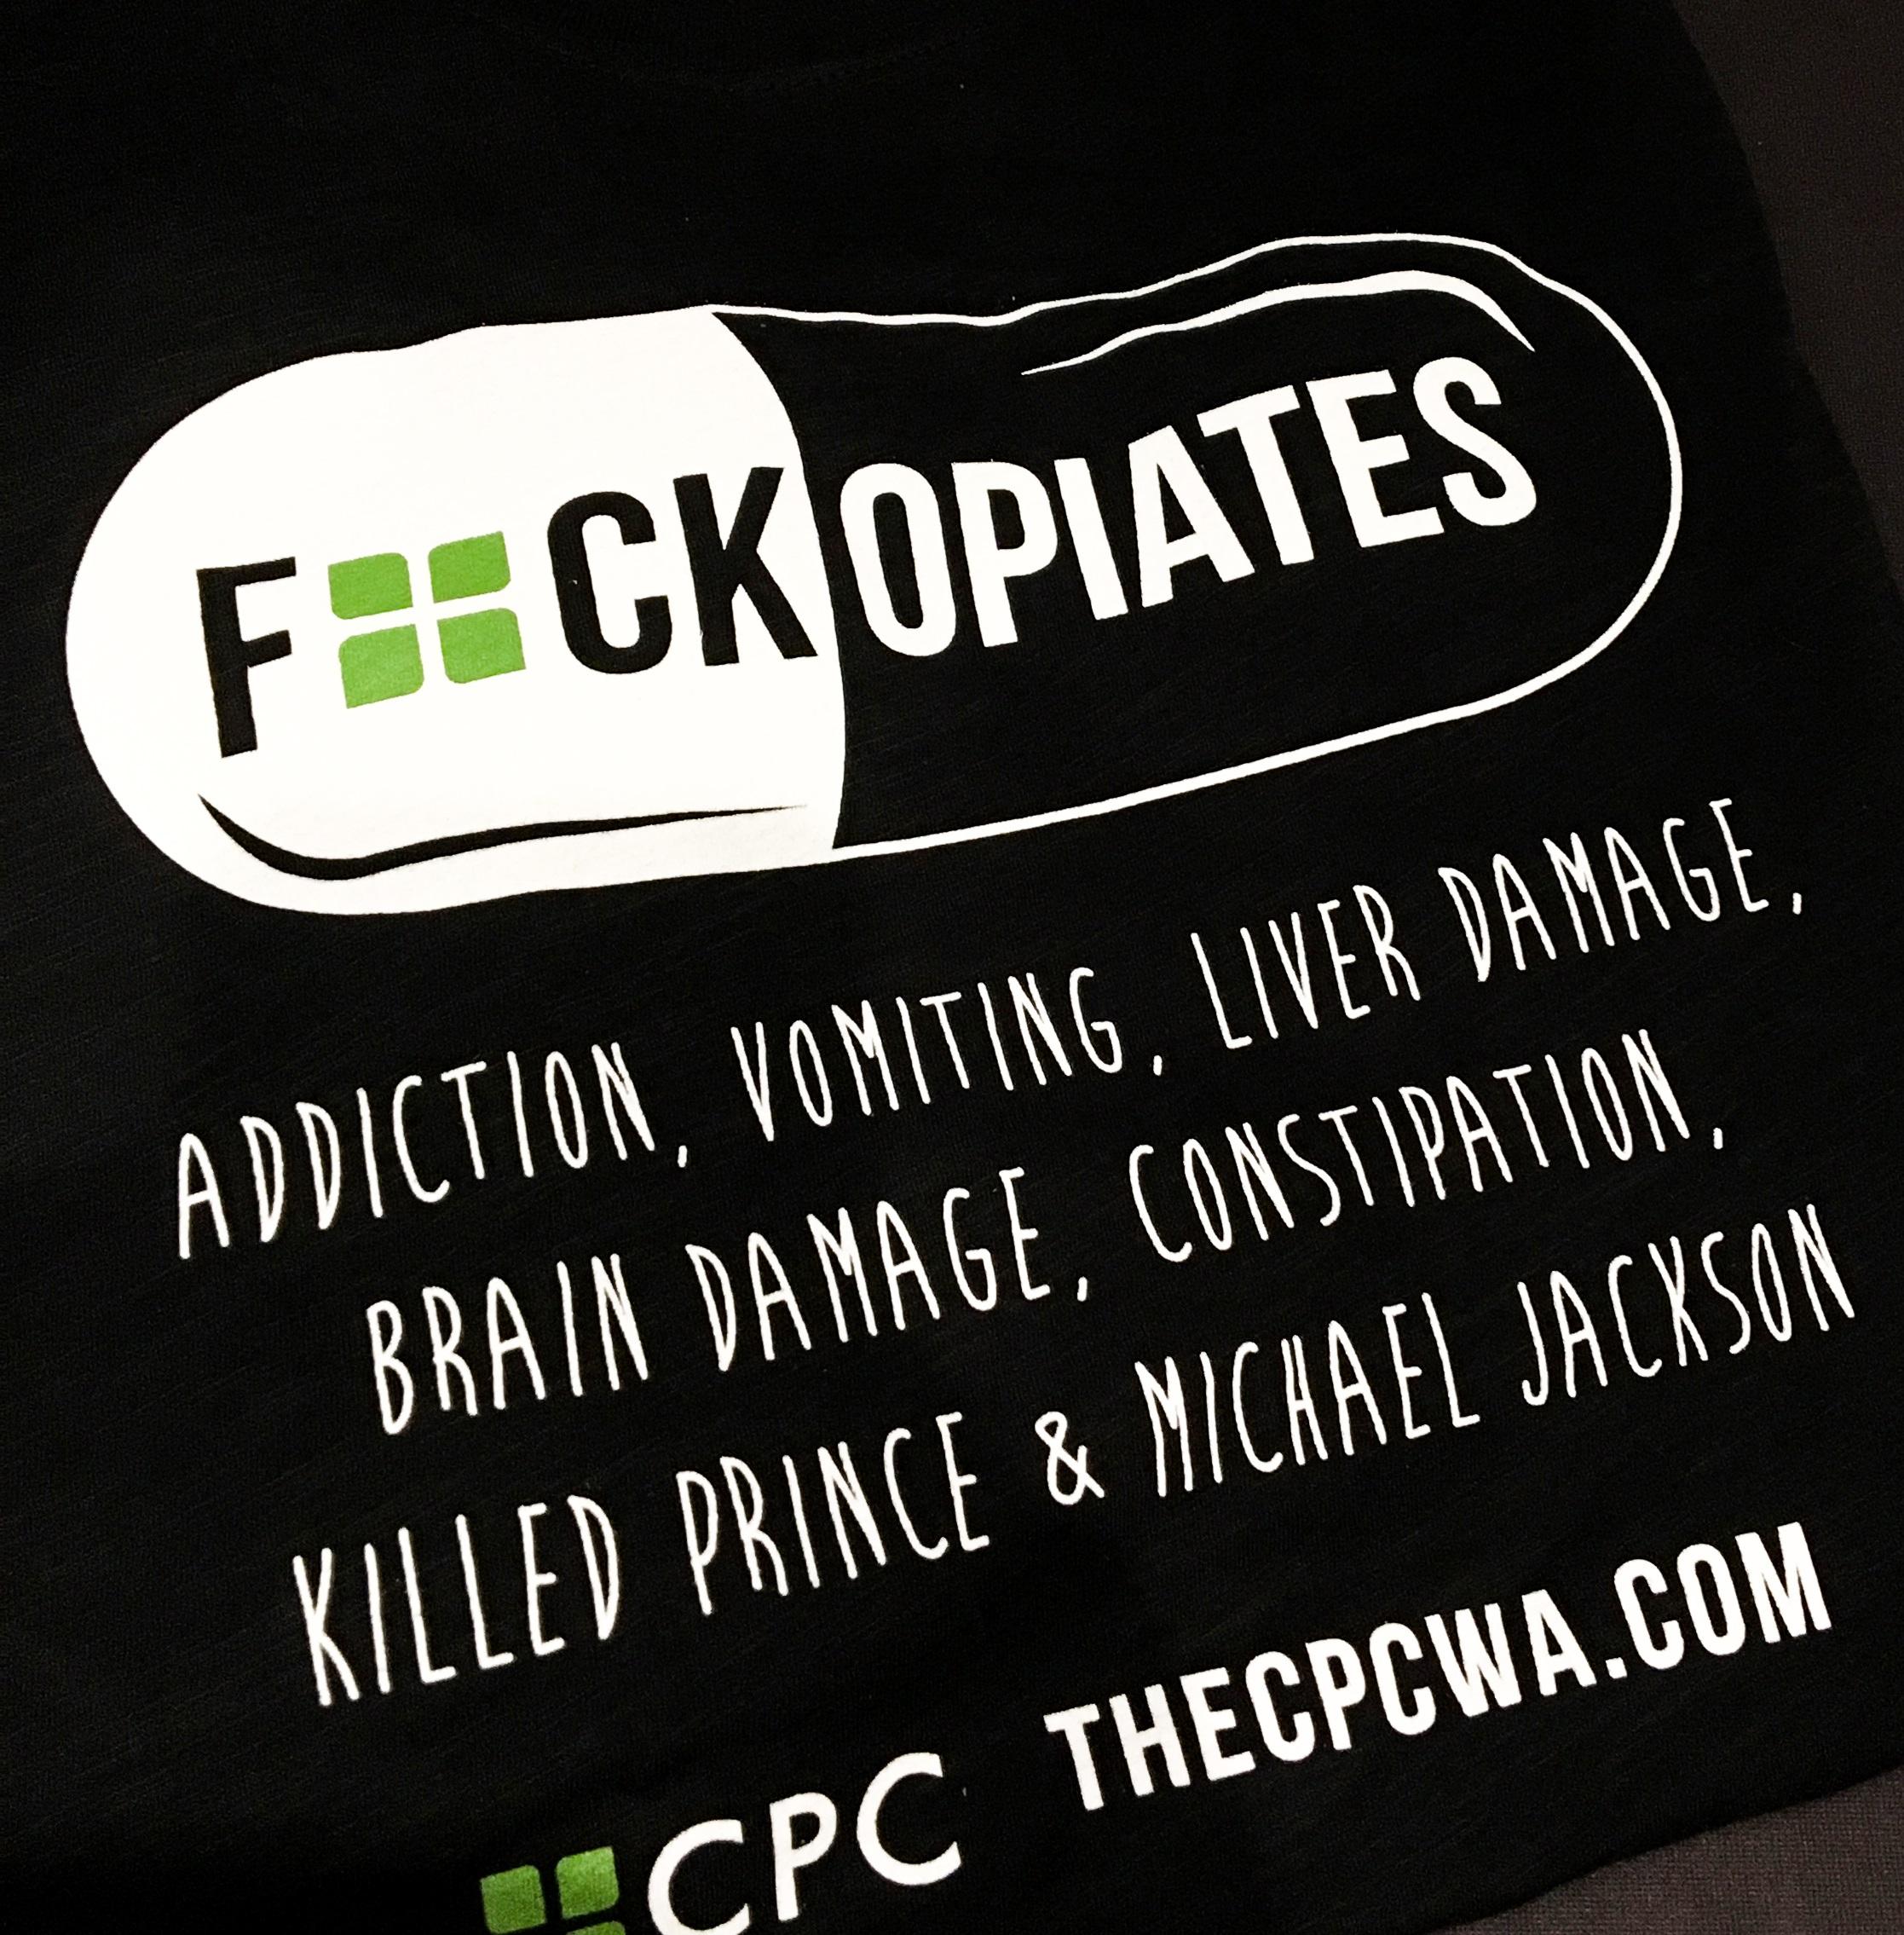 fuck opiates t shirt edited.jpg